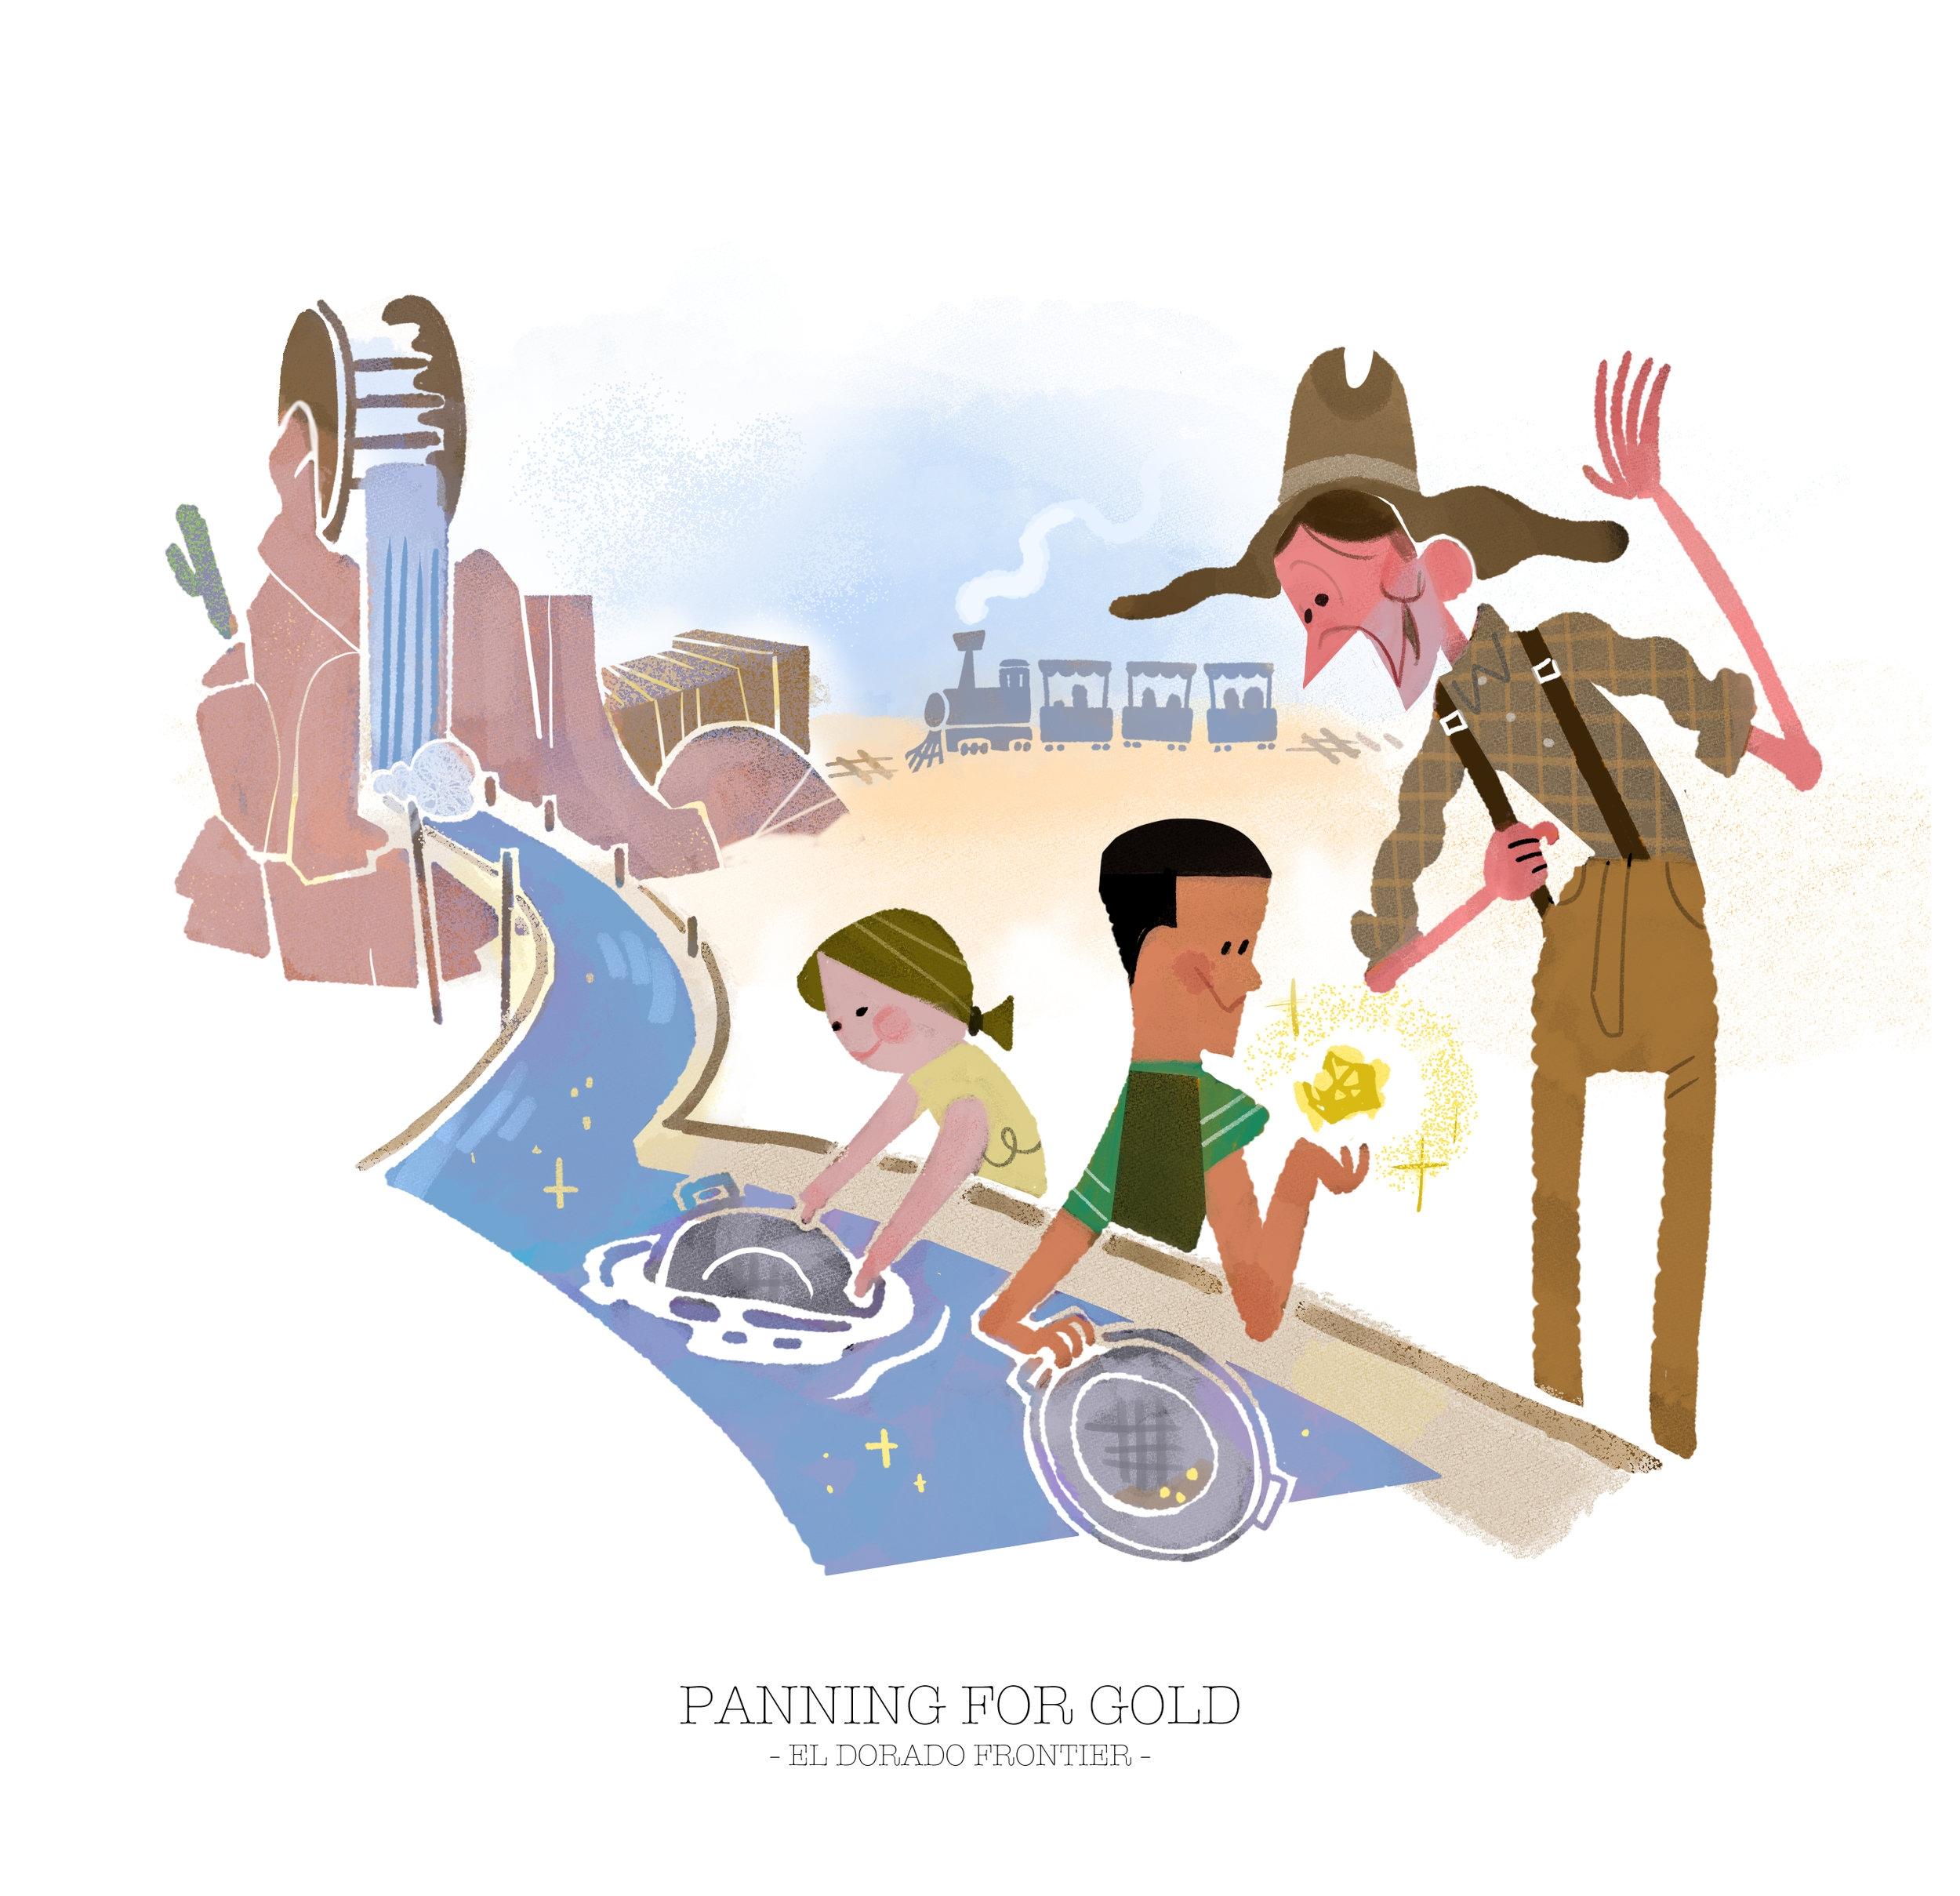 GoldPanning_Titled.jpg